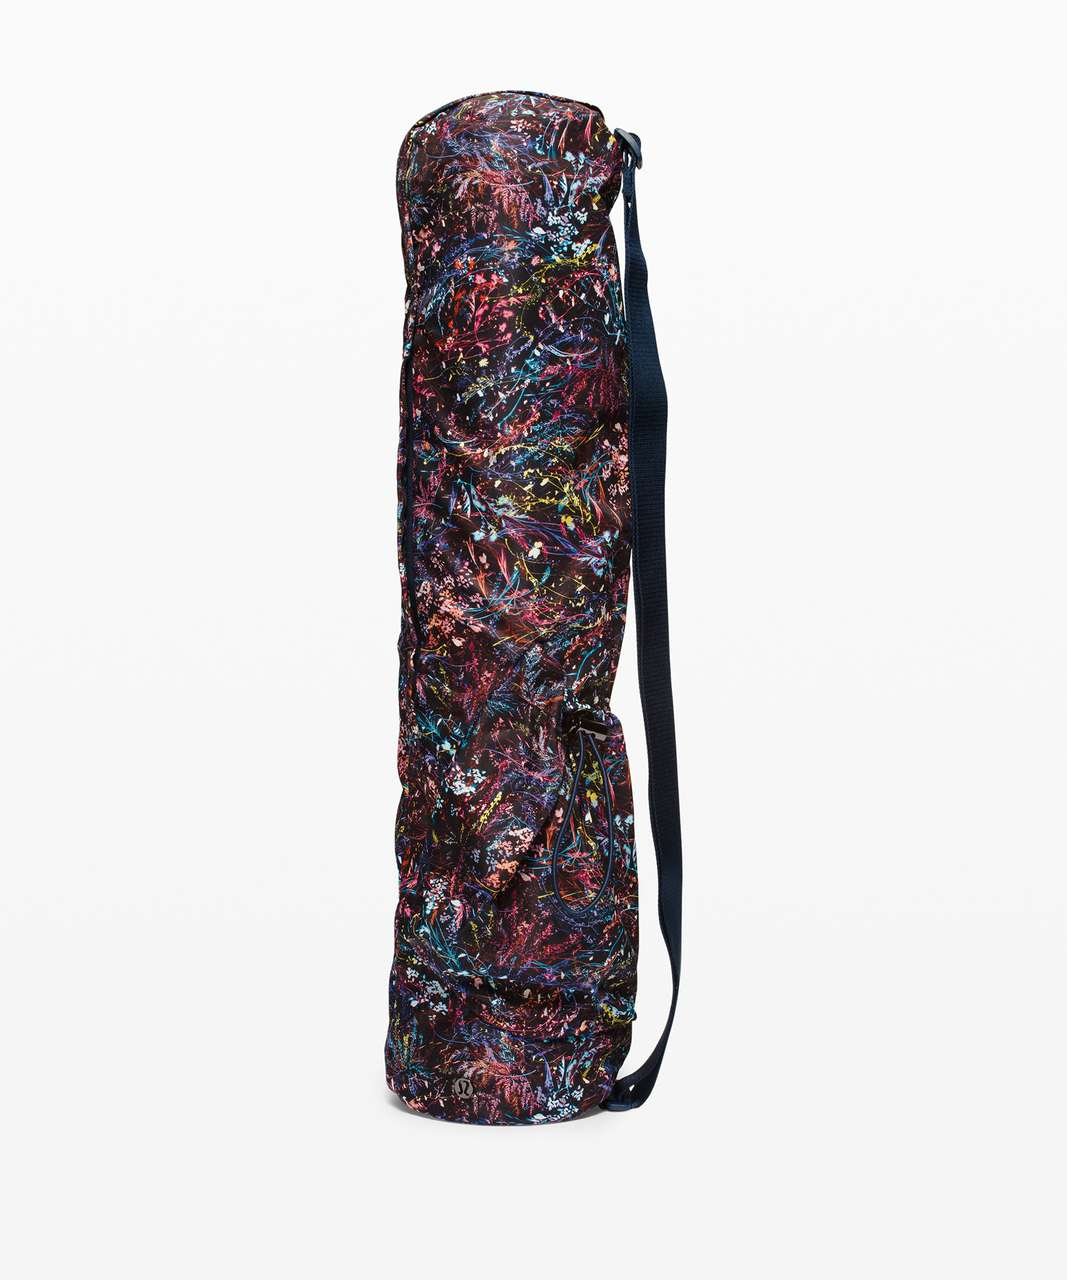 Lululemon The Yoga Mat Bag *16L - Foliage Overlay White Multi